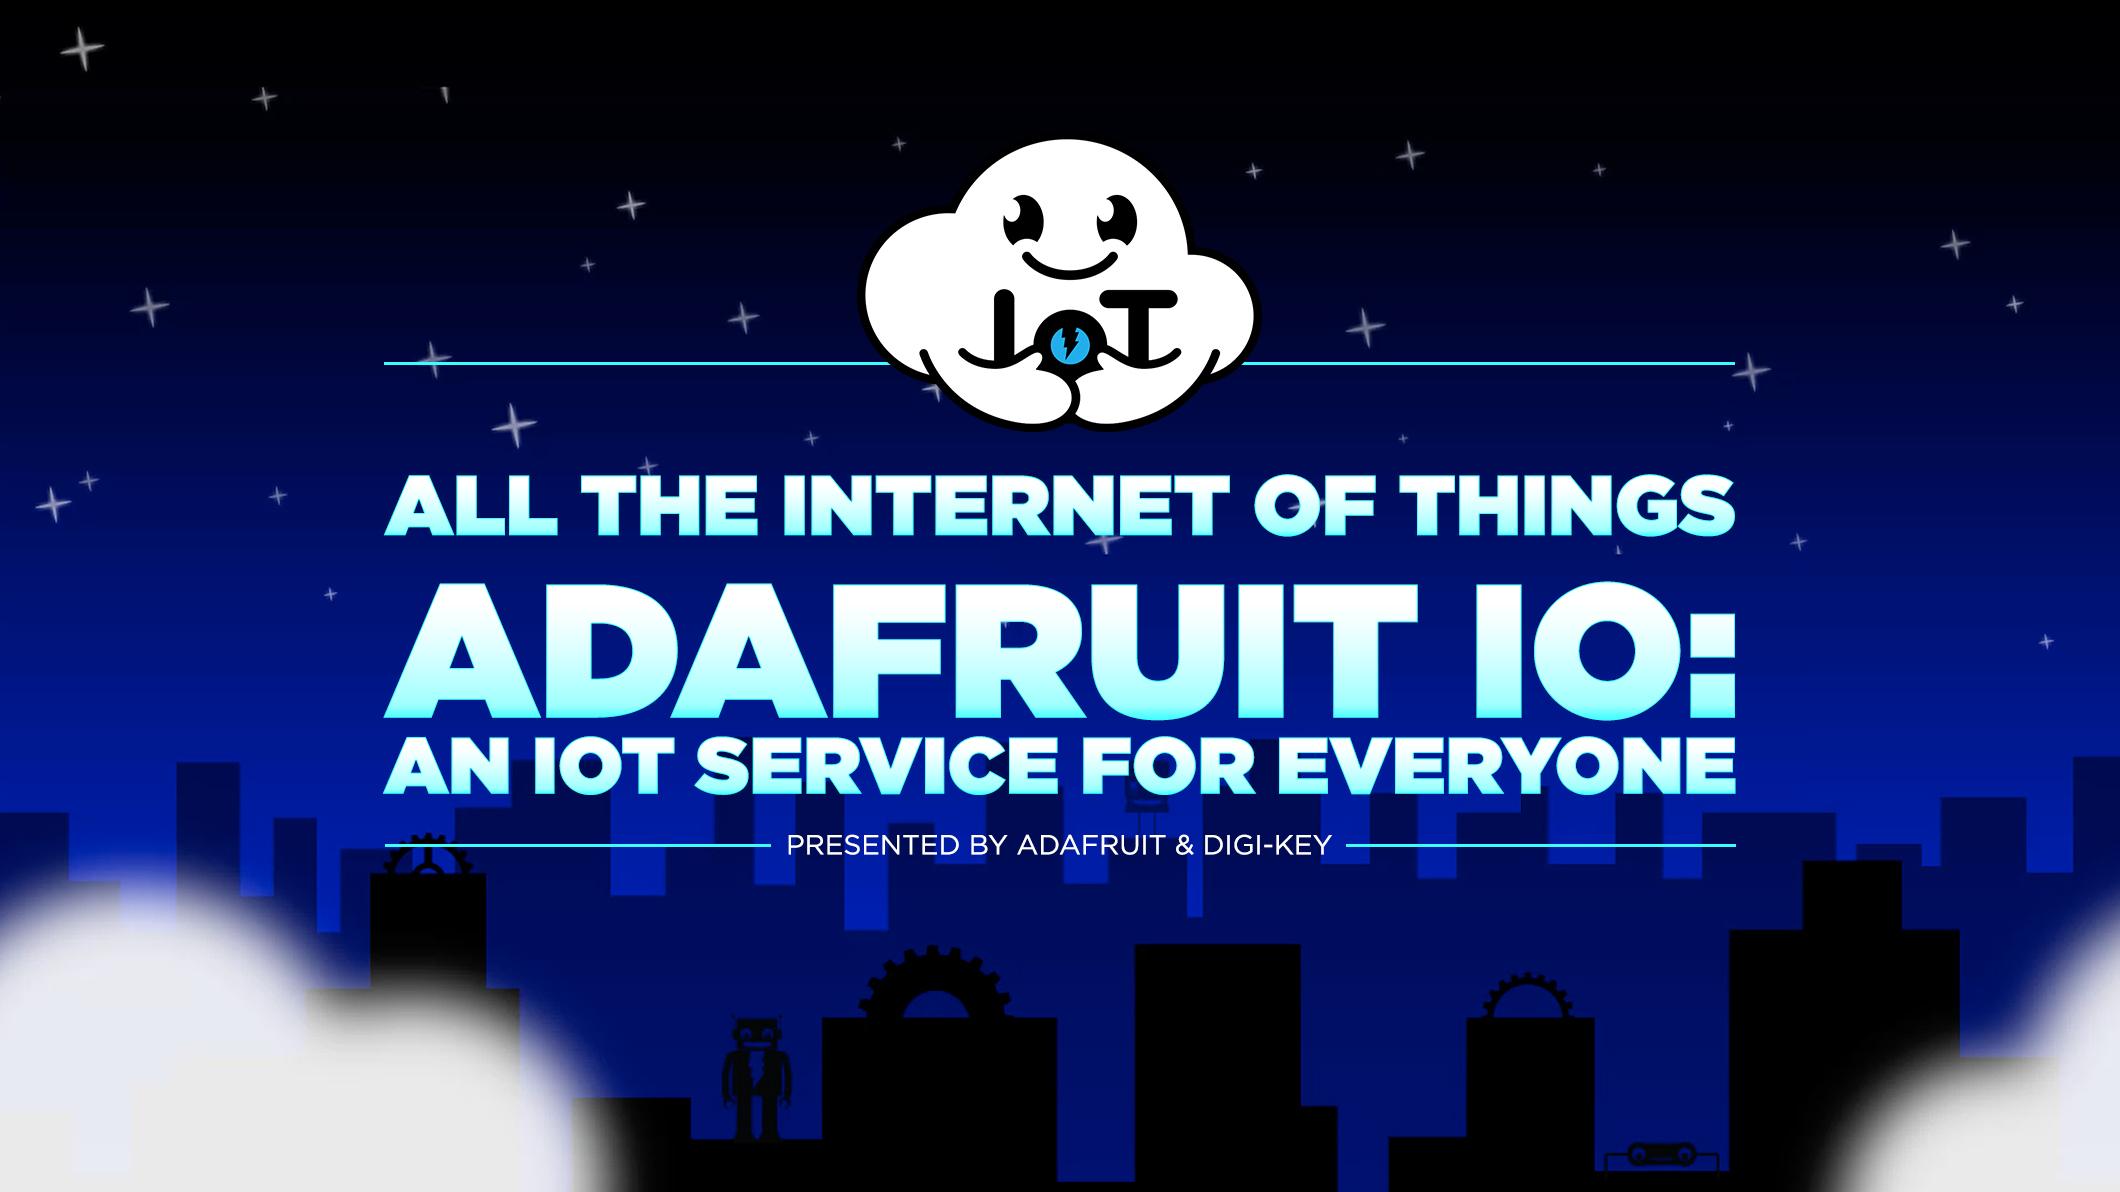 adafruit_io_adafruit_IoT_googleplus.jpg